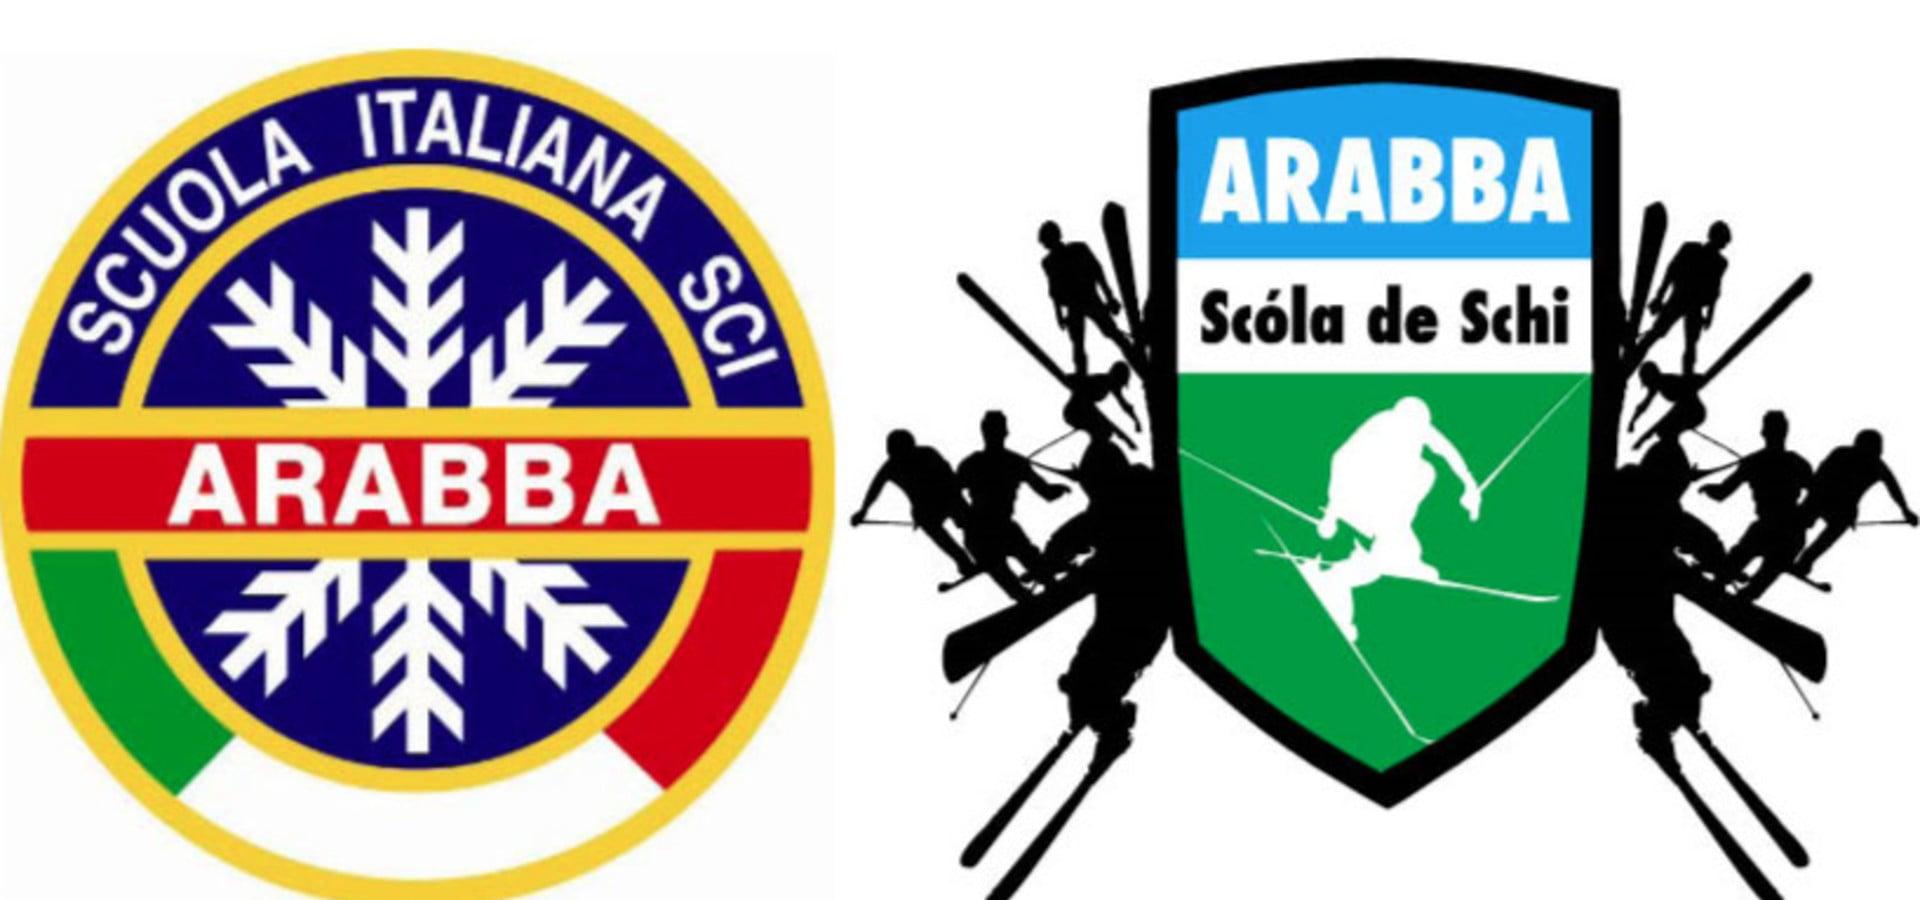 Ski & Snowboard School Arabba